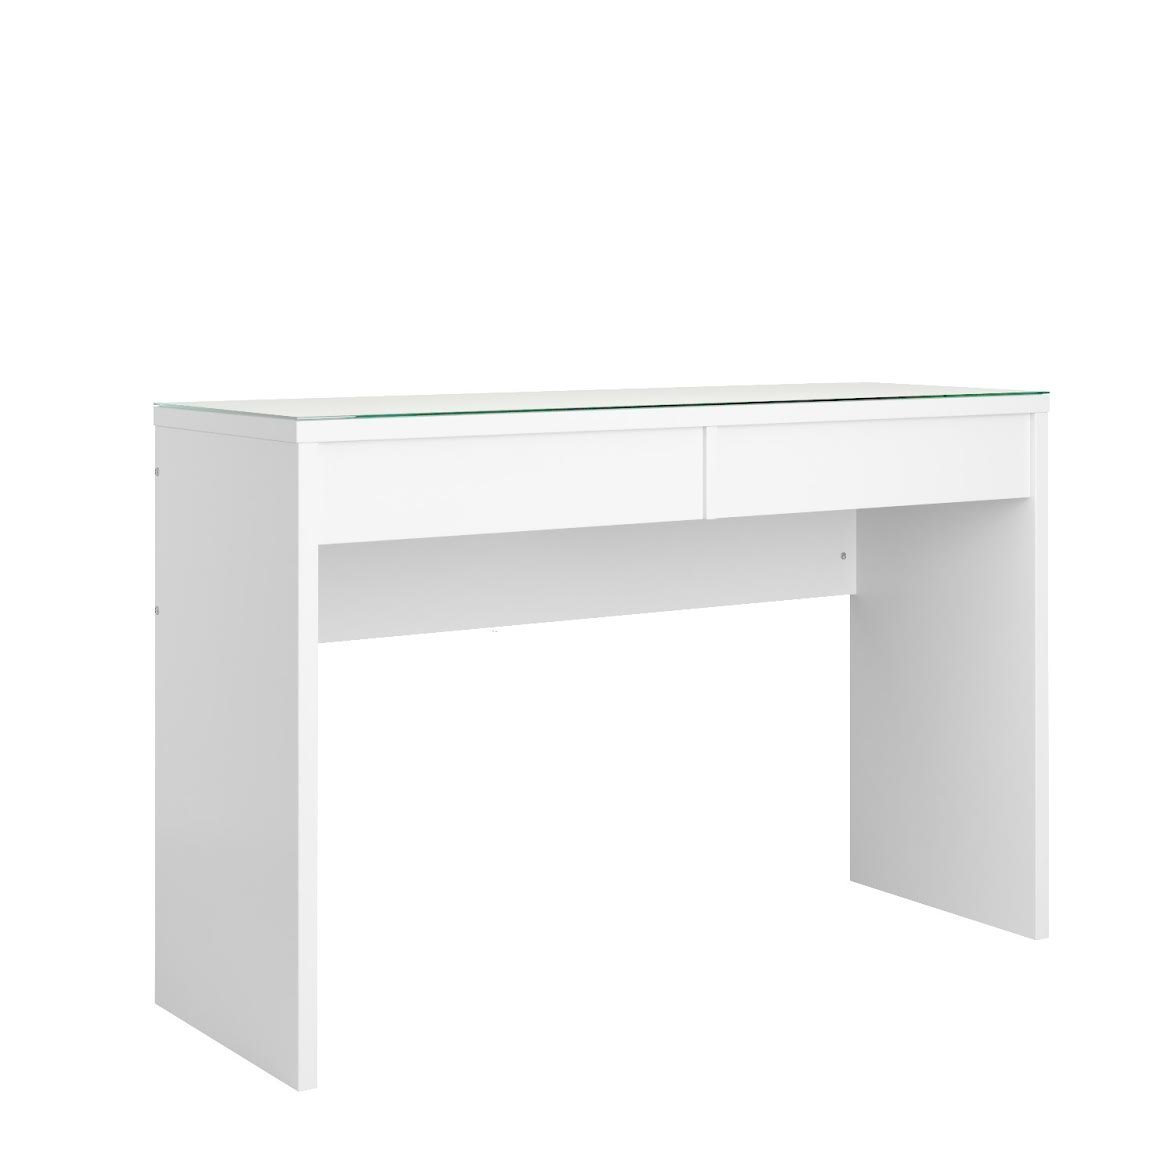 amazoncom modern sofa living room entryway table console with   - amazoncom modern sofa living room entryway table console with  drawers white … kitchen  dining